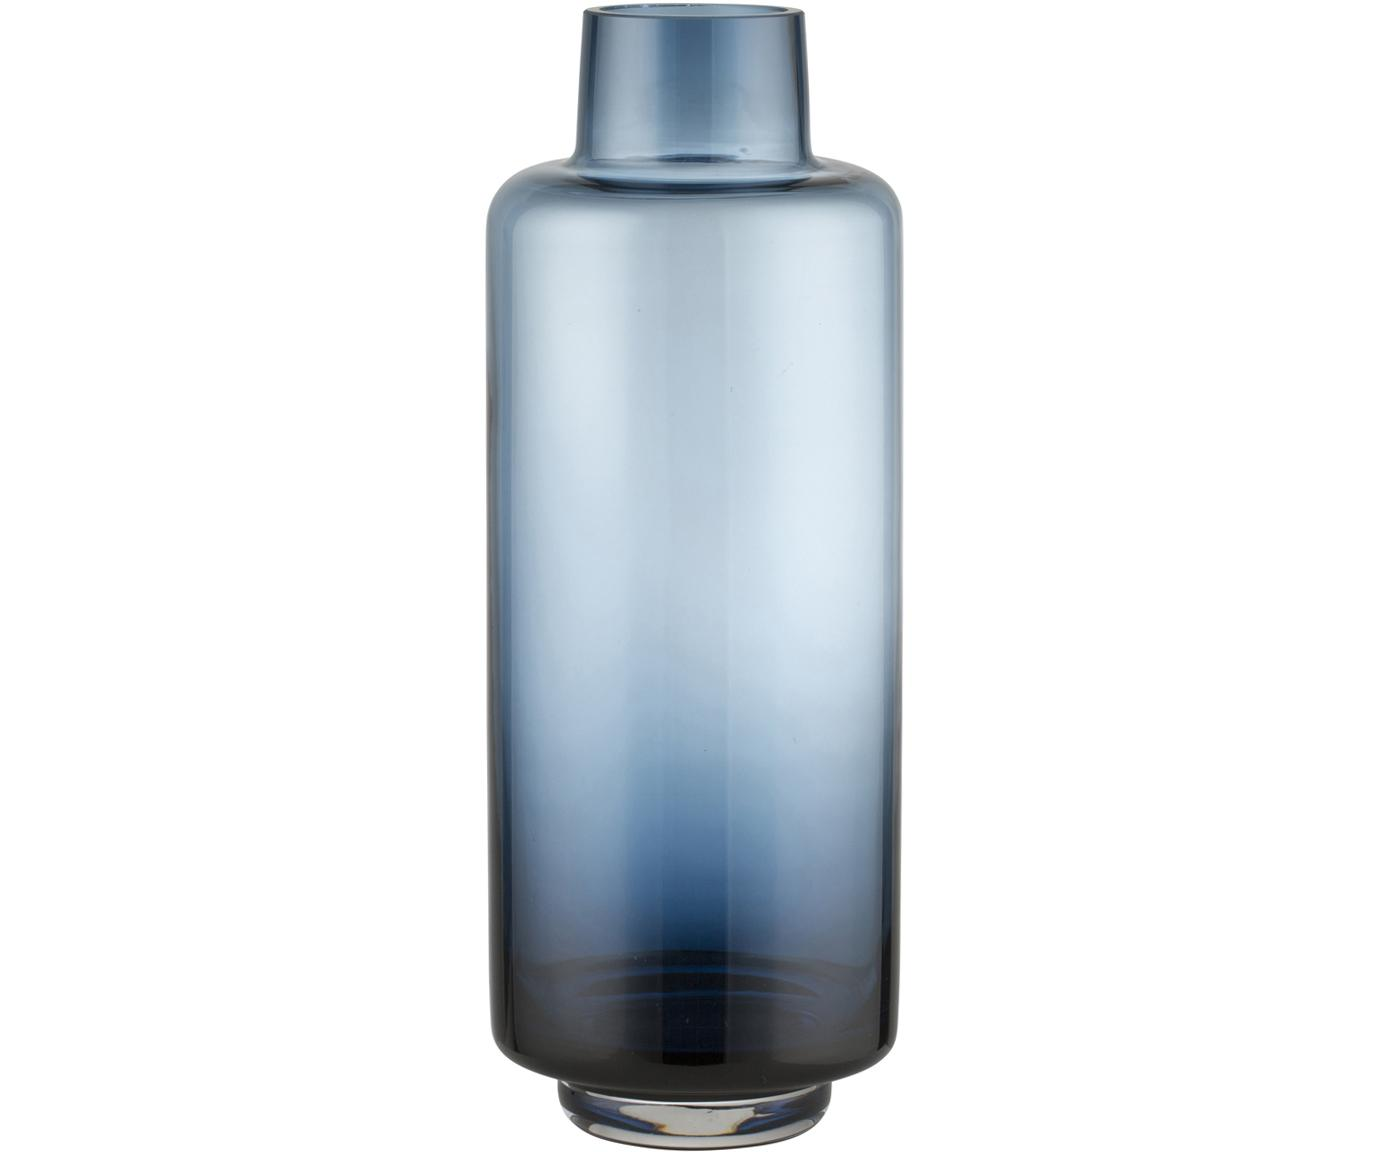 Grosse mundgeblasene Vase Hedria, Glas, Blau, Ø 11 x H 30 cm